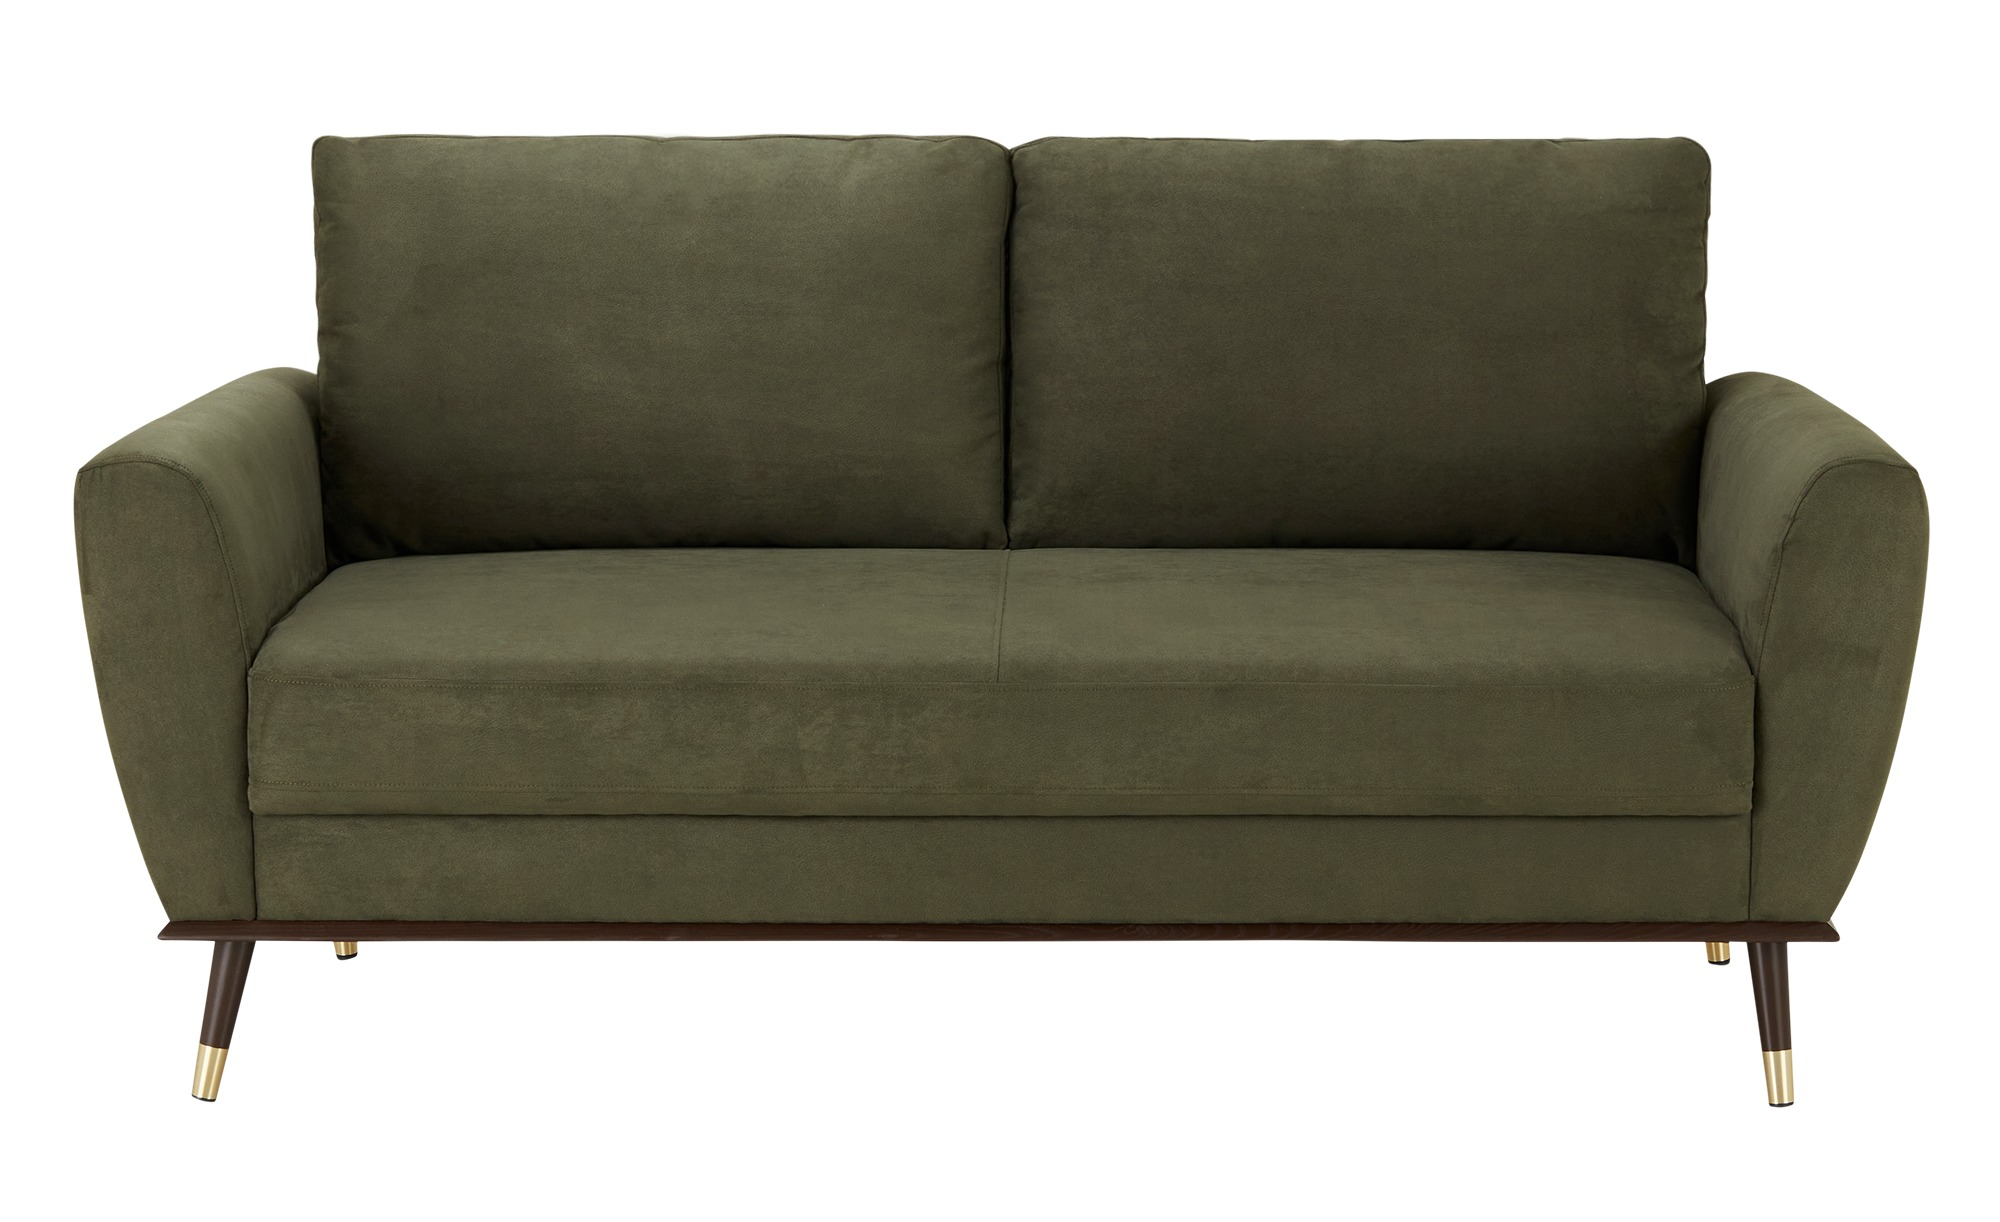 Sofa  Johanna ¦ grün ¦ Maße (cm): B: 168 H: 72 T: 87 Polstermöbel > Sofas > Einzelsofas - Höffner